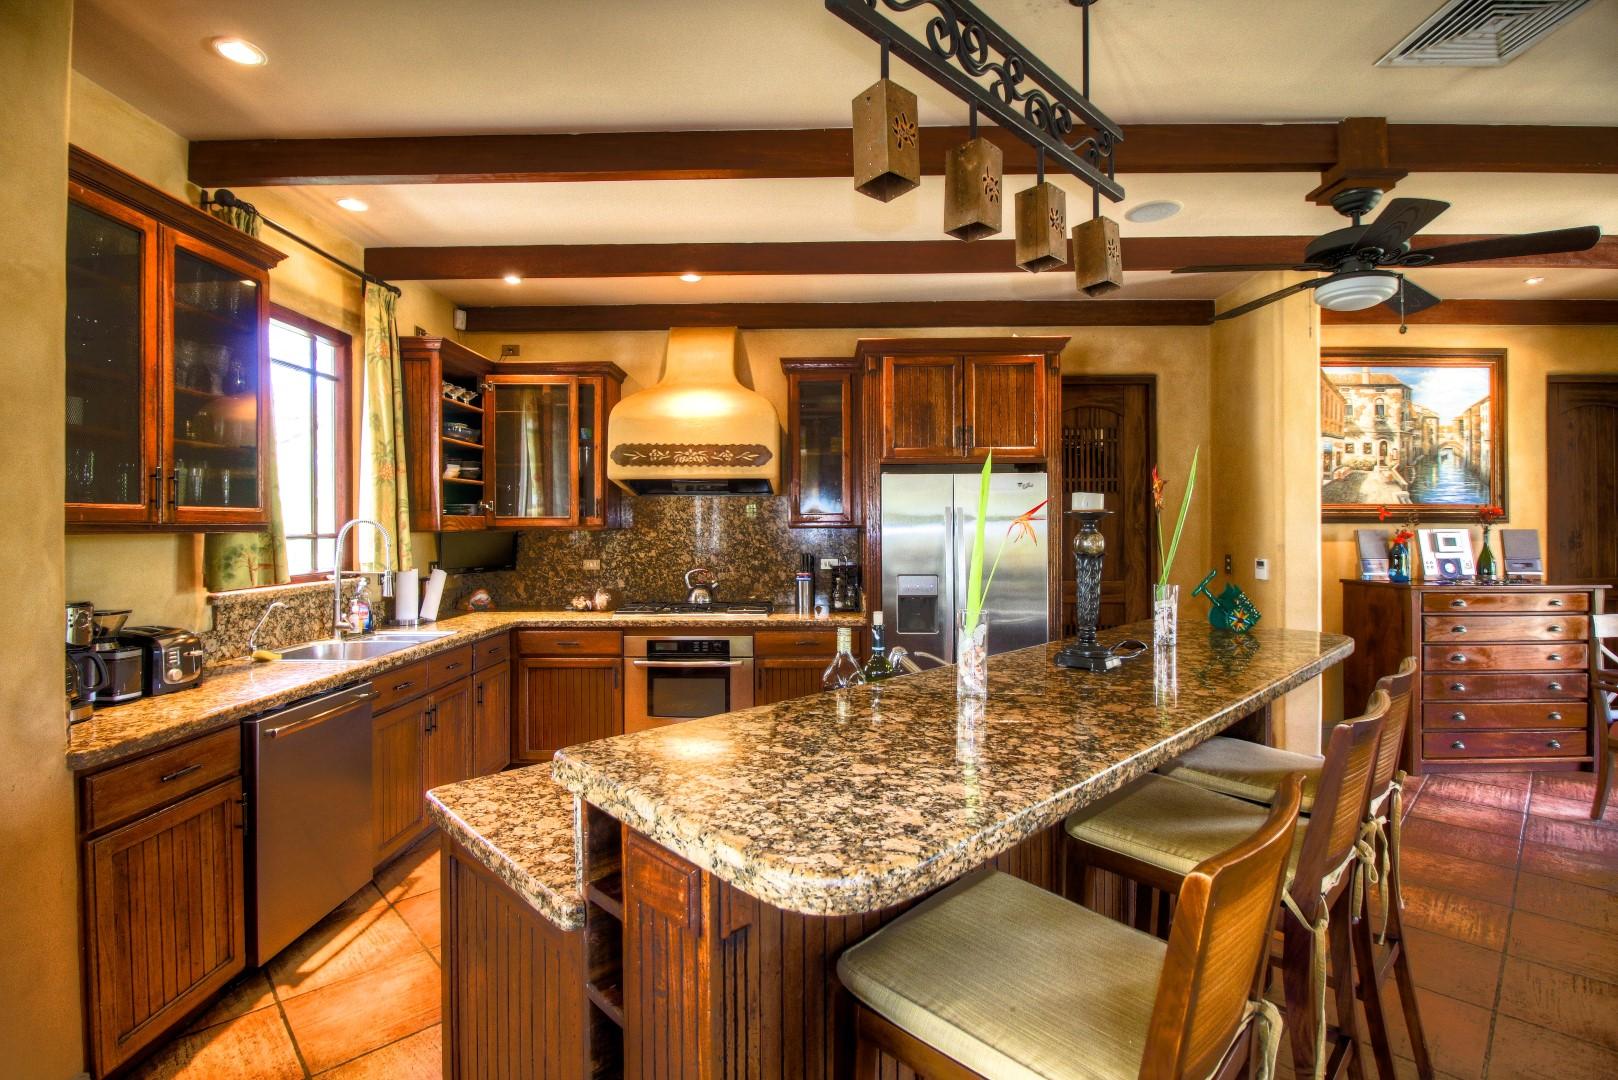 Granite counter-tops, steel appliances